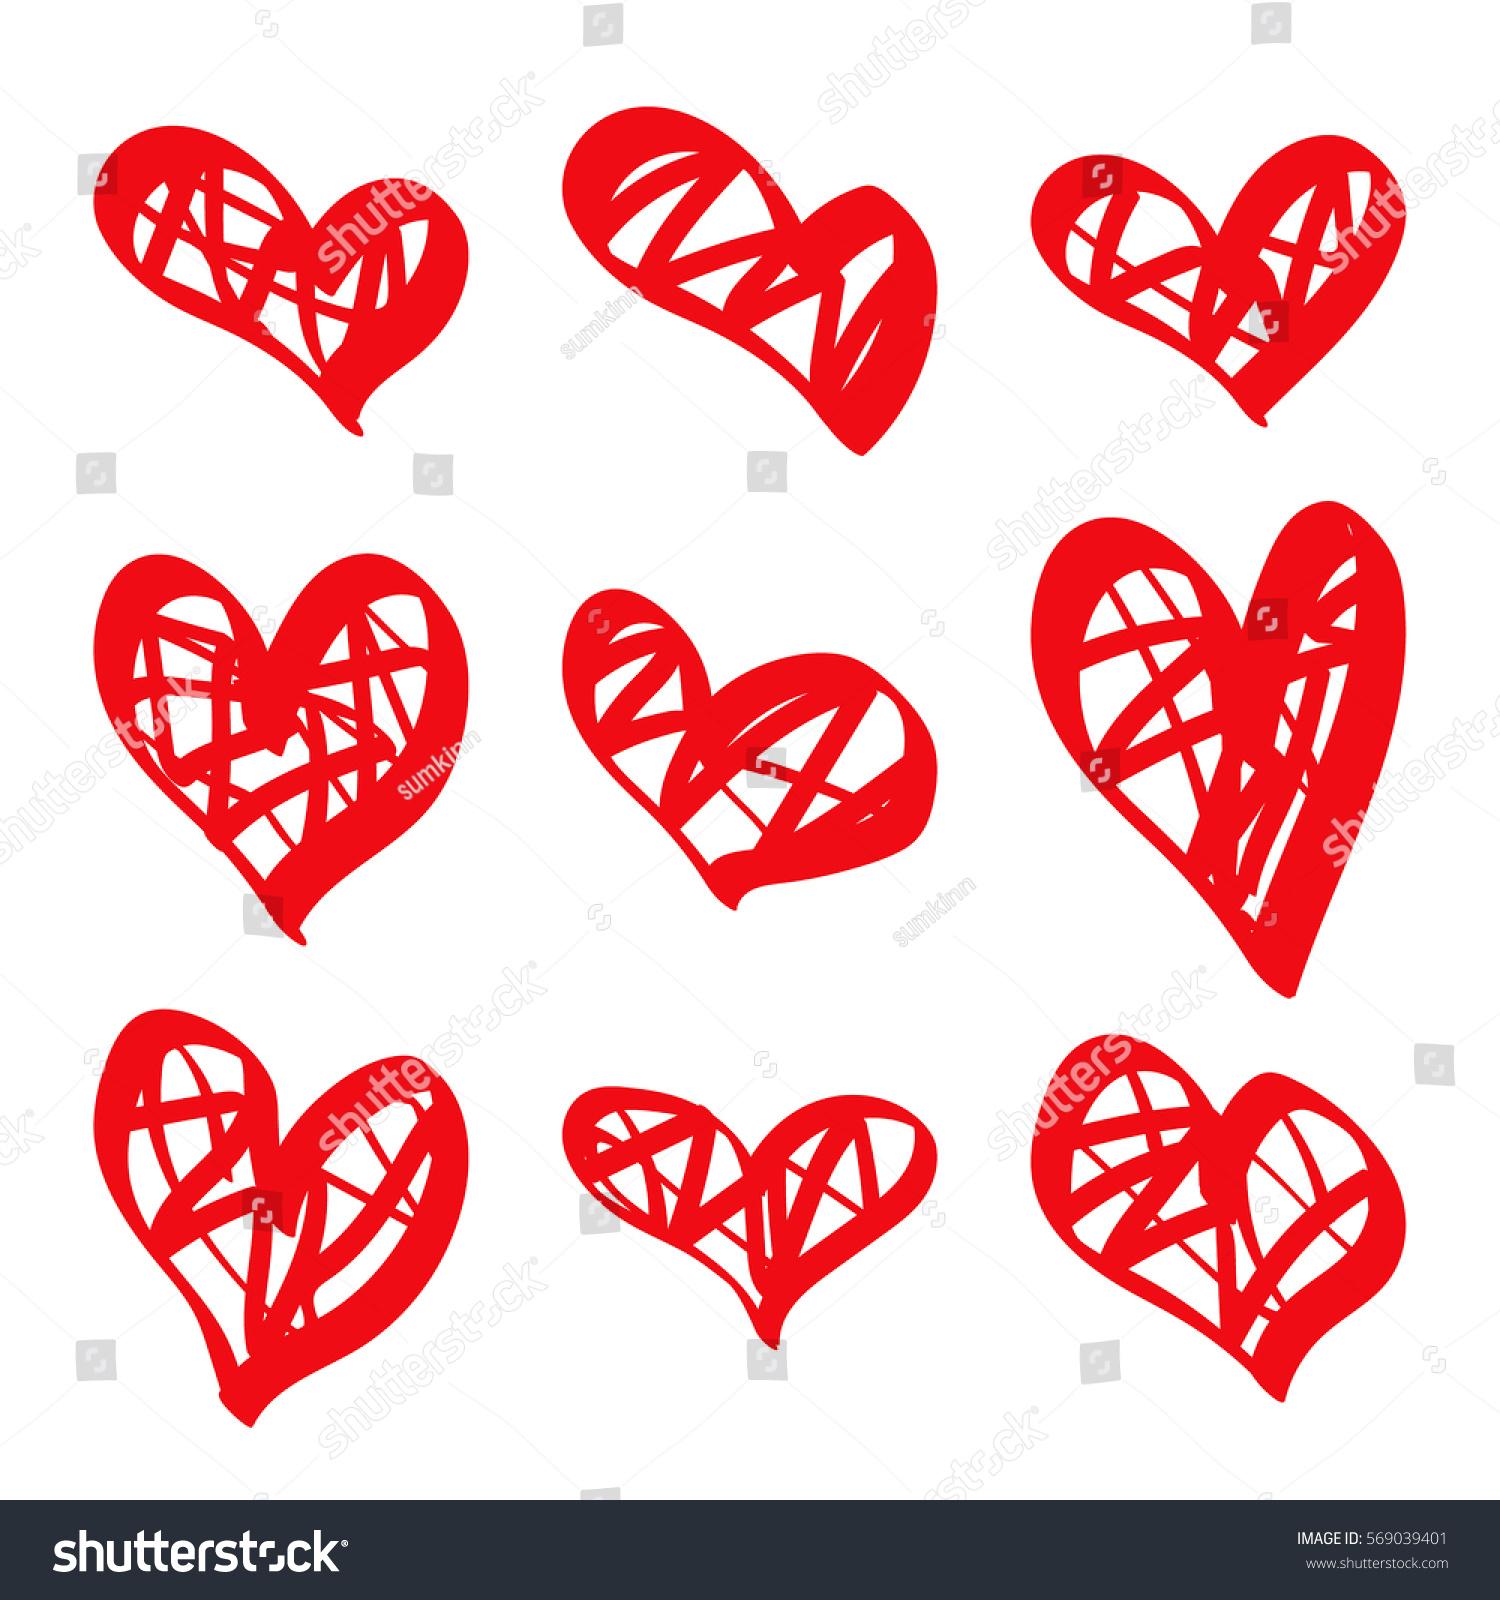 modern vector set hand drawn red stock vector 569039401 shutterstock